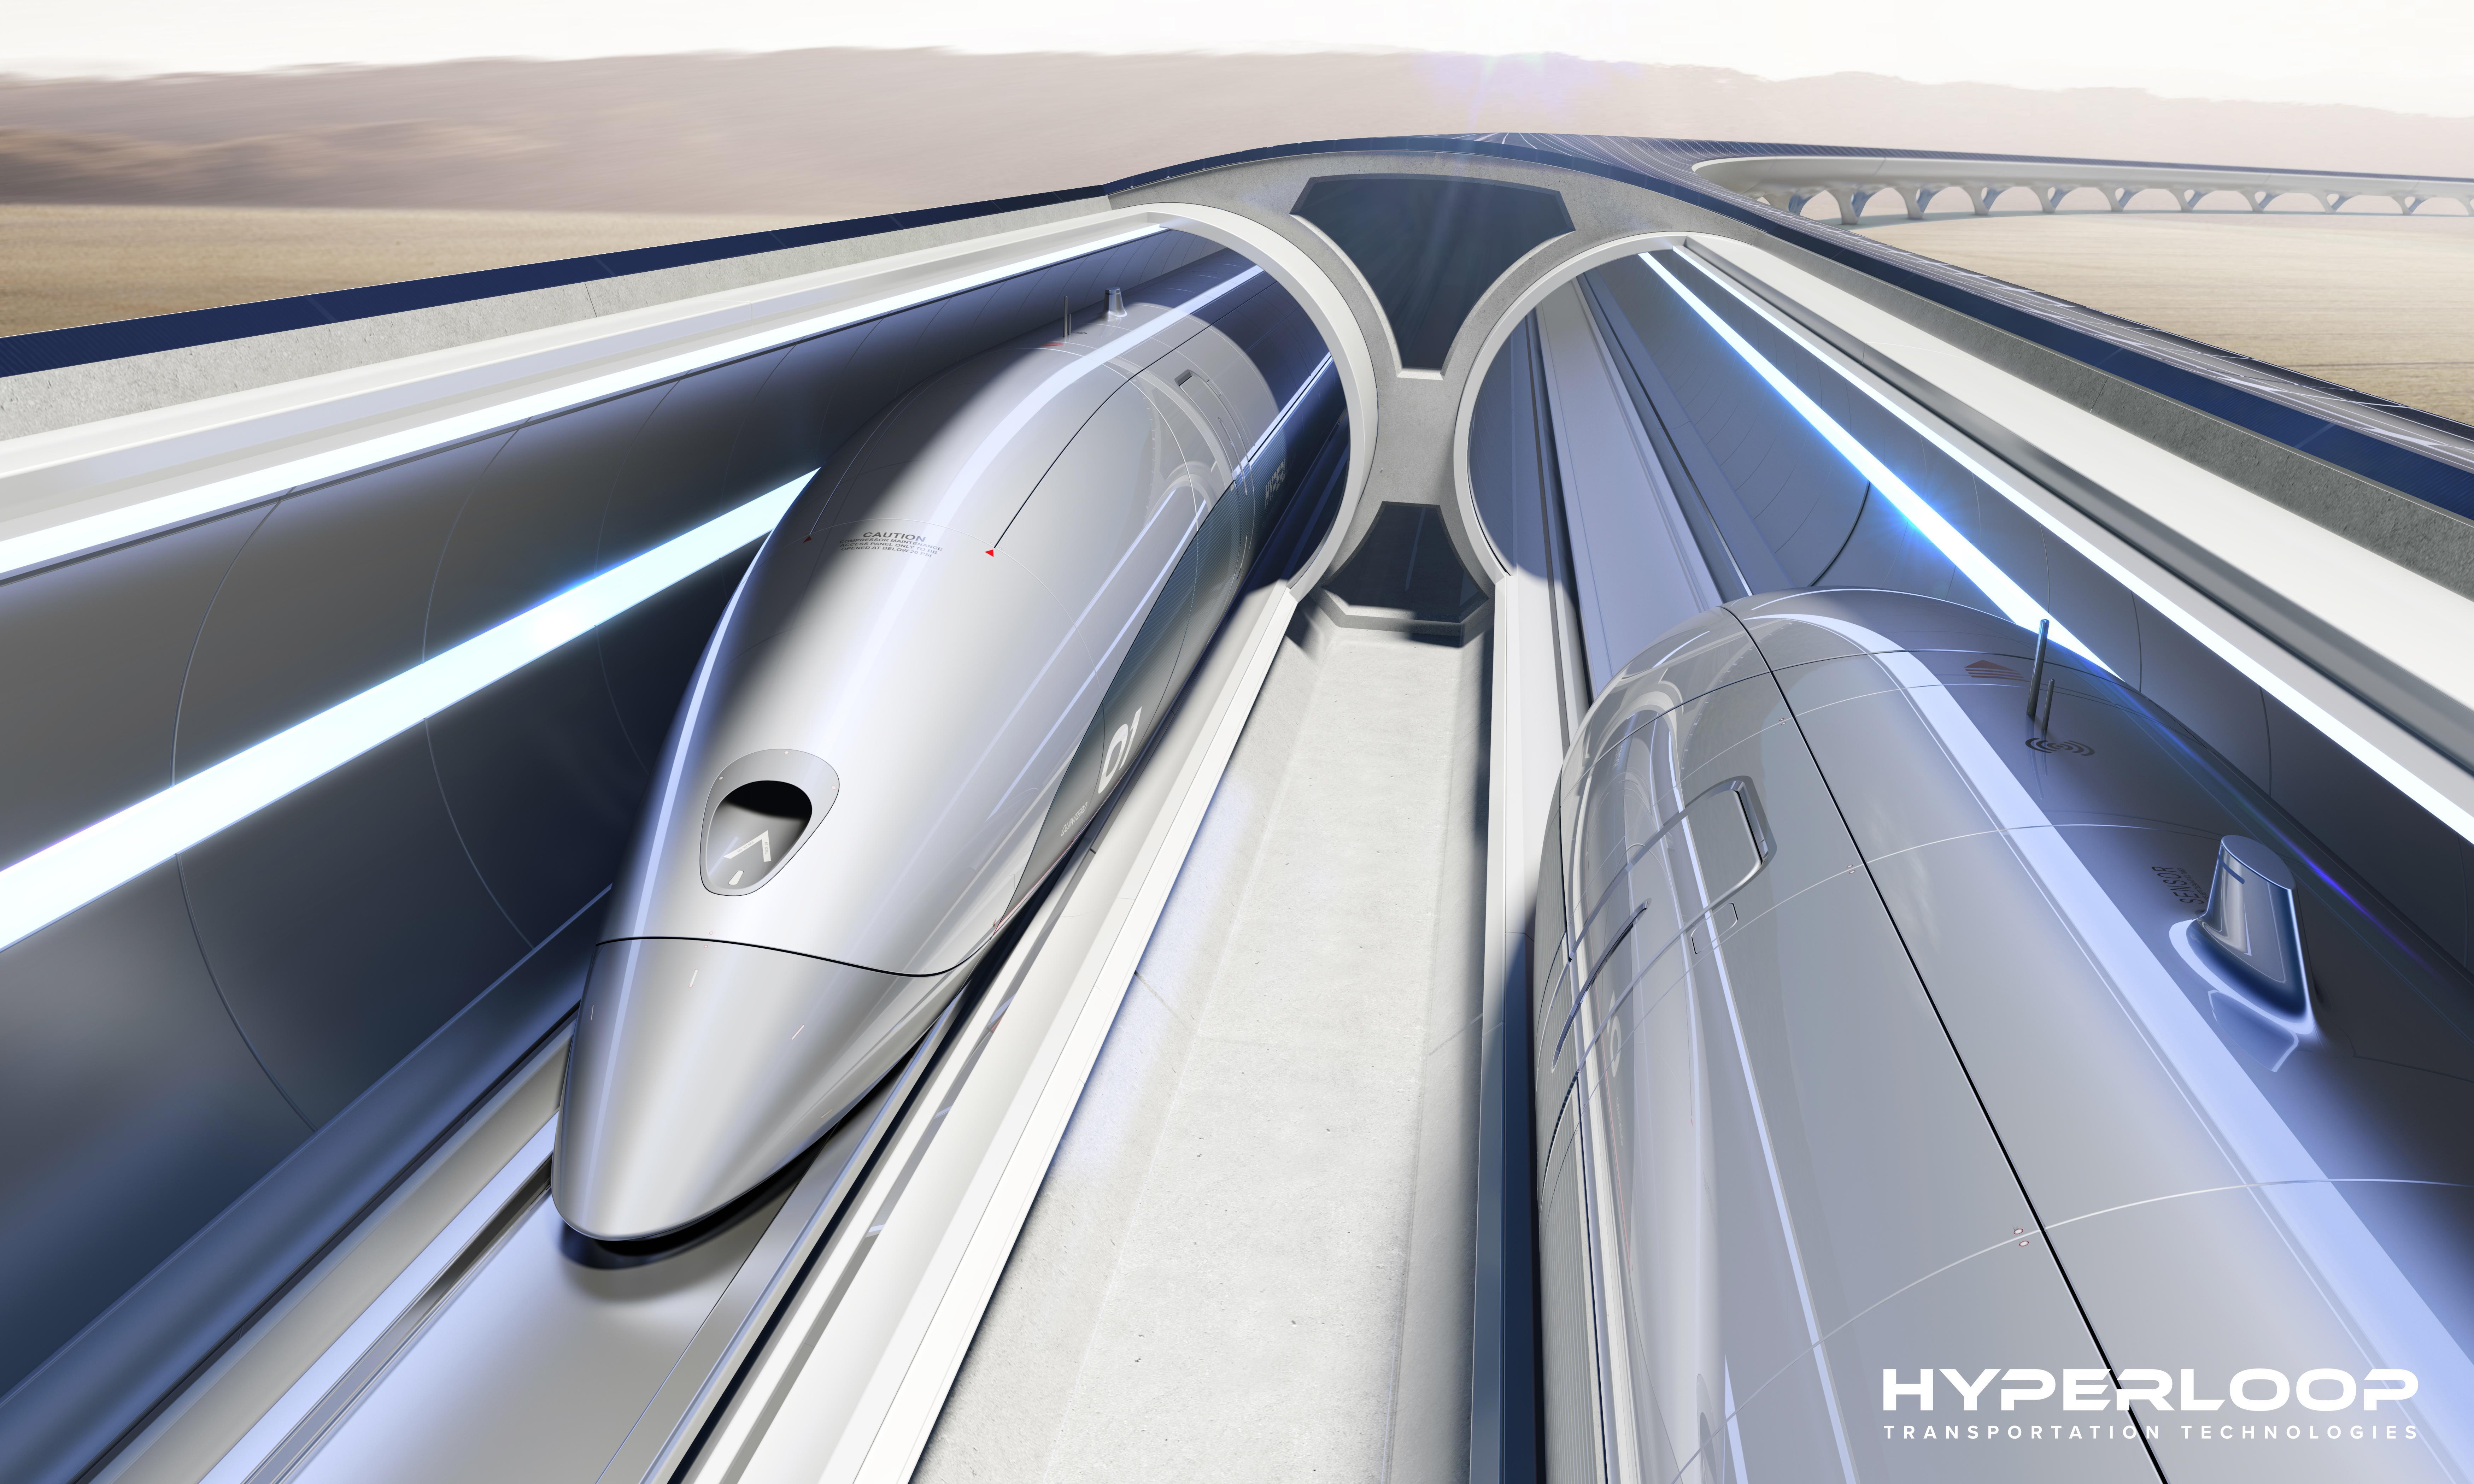 Abu Dhabi will zehn Kilometer lange Hyperloop-Strecke bauen